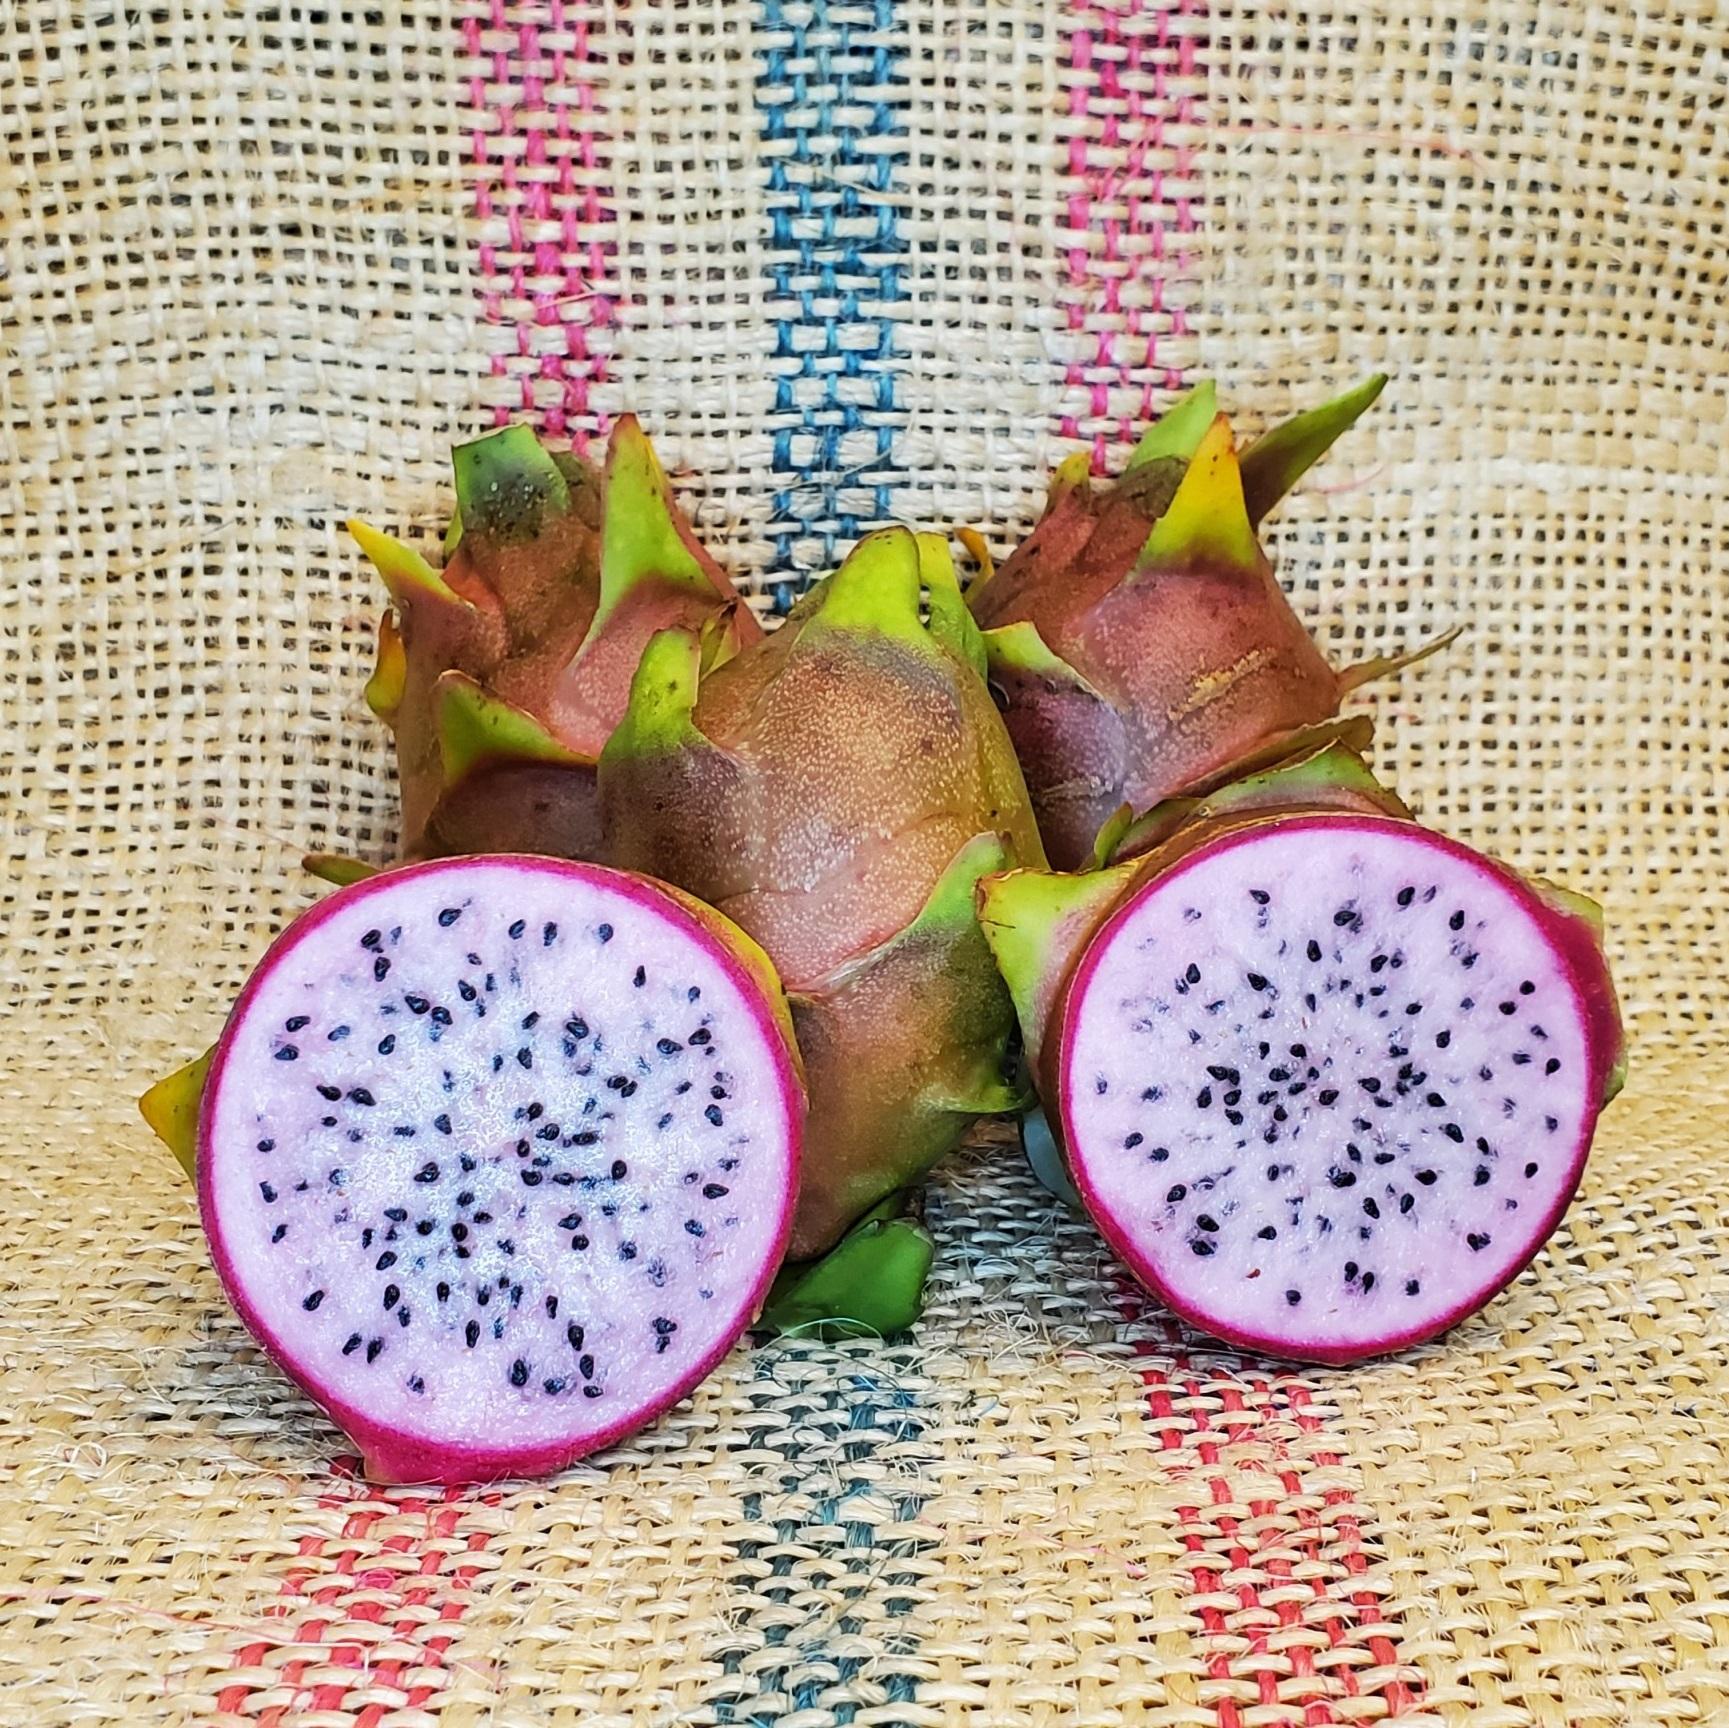 Asunta 2 Dragon Fruit by Spicy Exotics